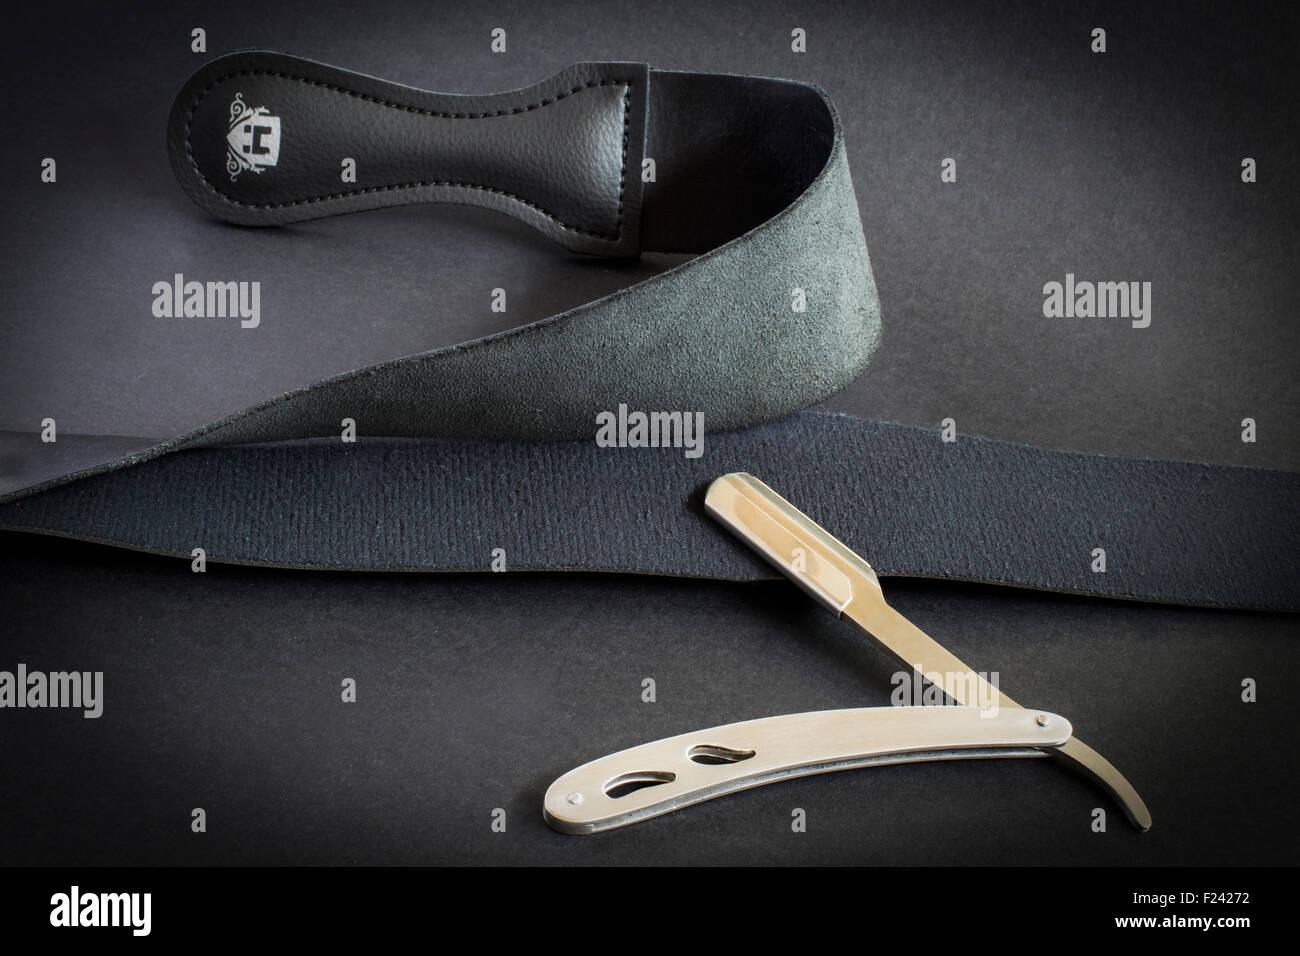 sharpen razor - Stock Image